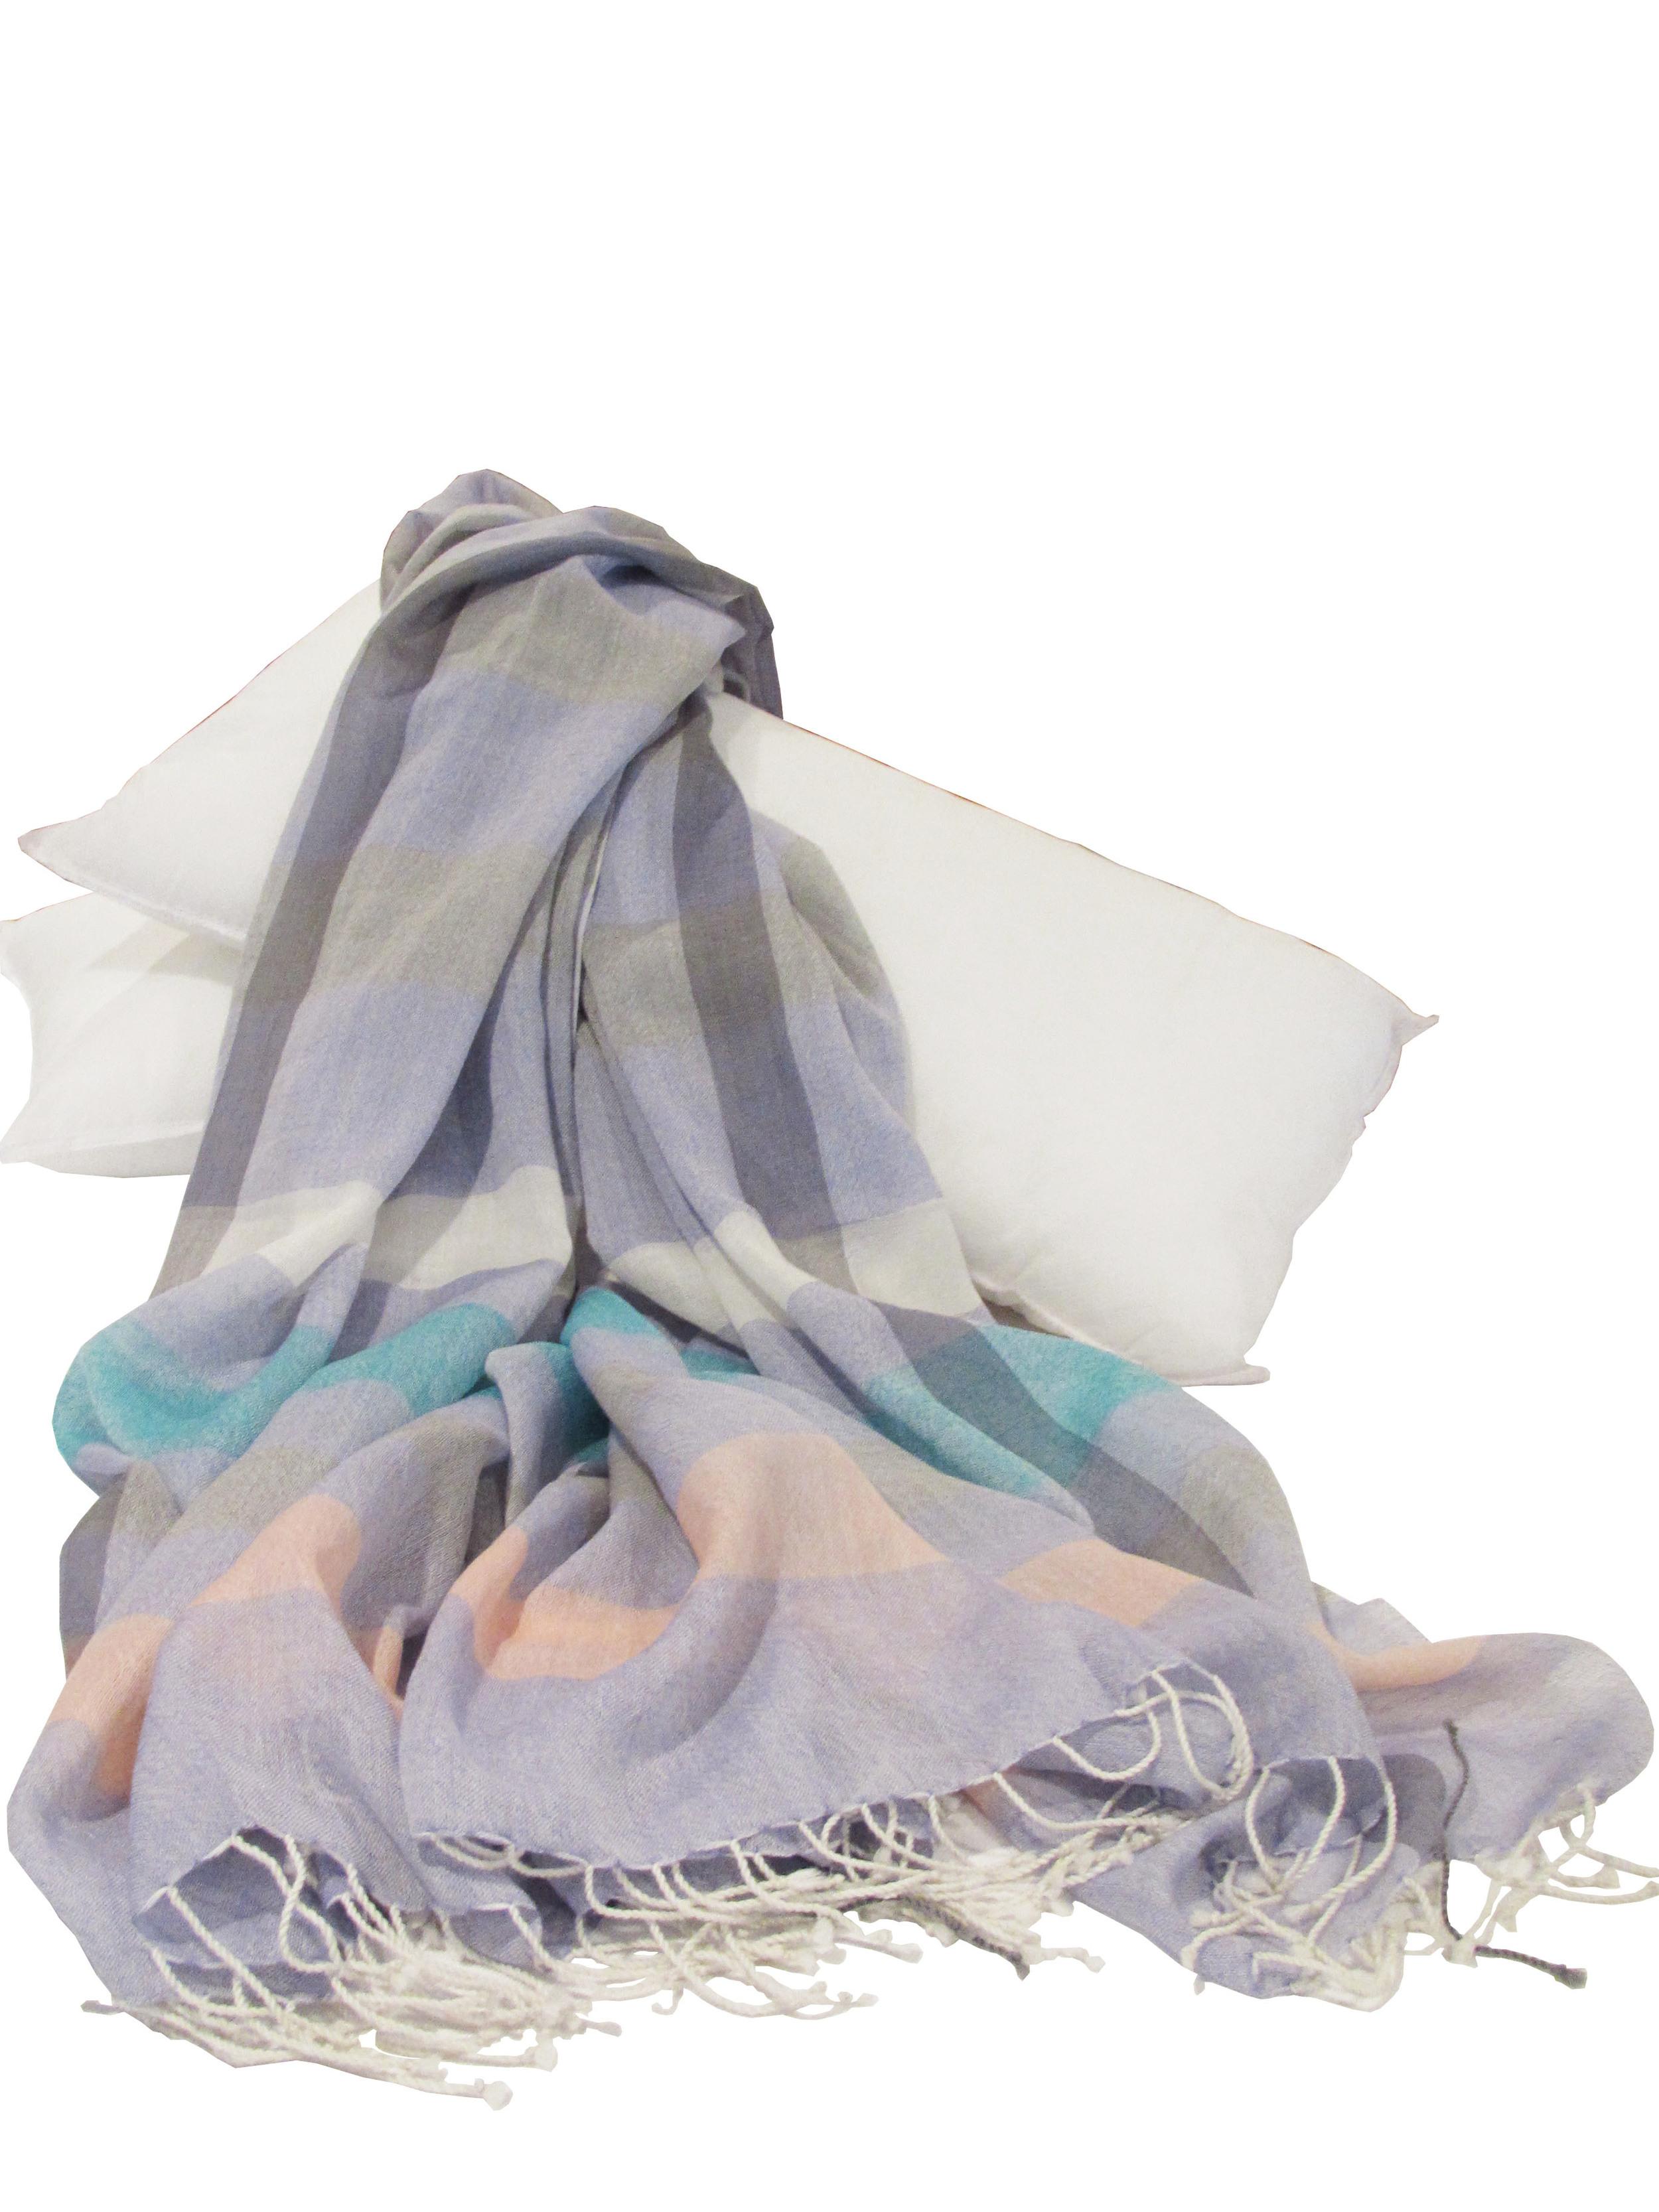 Stripes on lavender, THW-WO-WV-002-LAV